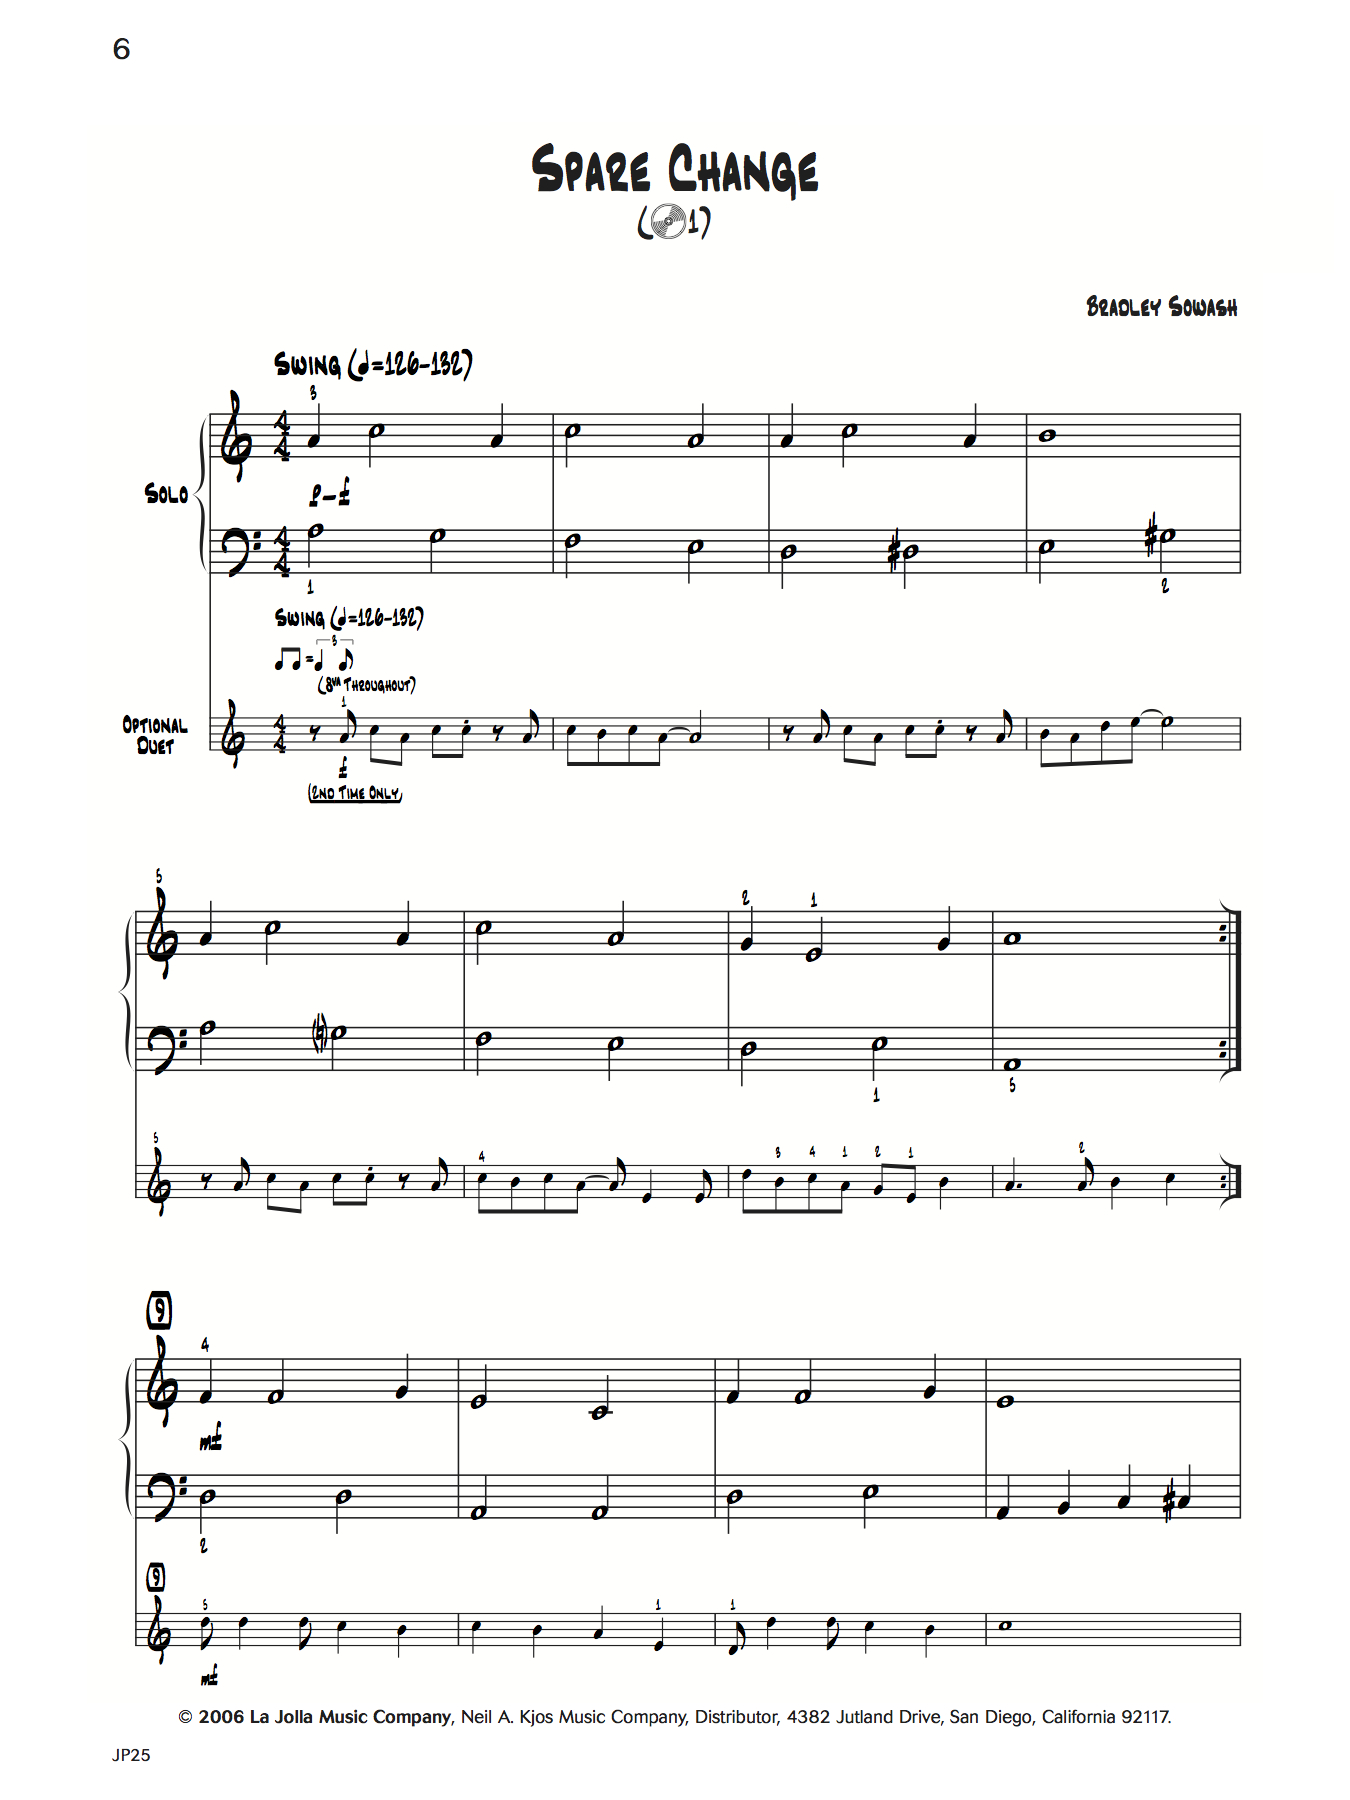 That's Jazz Method 1 - Getting Into It - hard copy — Bradley Sowash Music